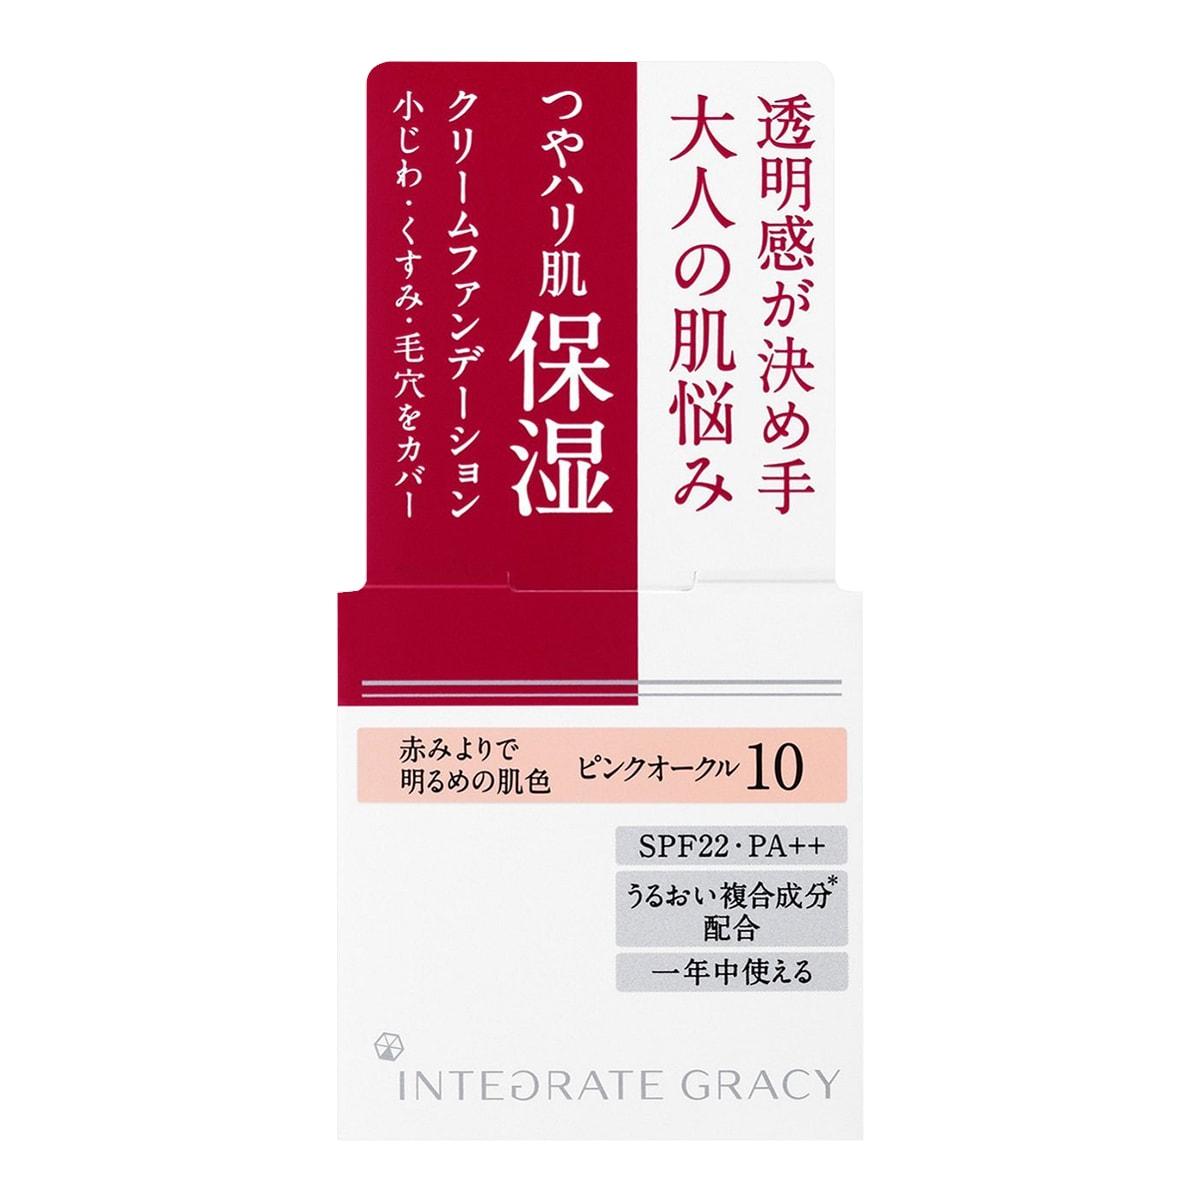 SHISEIDO INTEGRATE GRACY Moist Cream Foundation #PO10